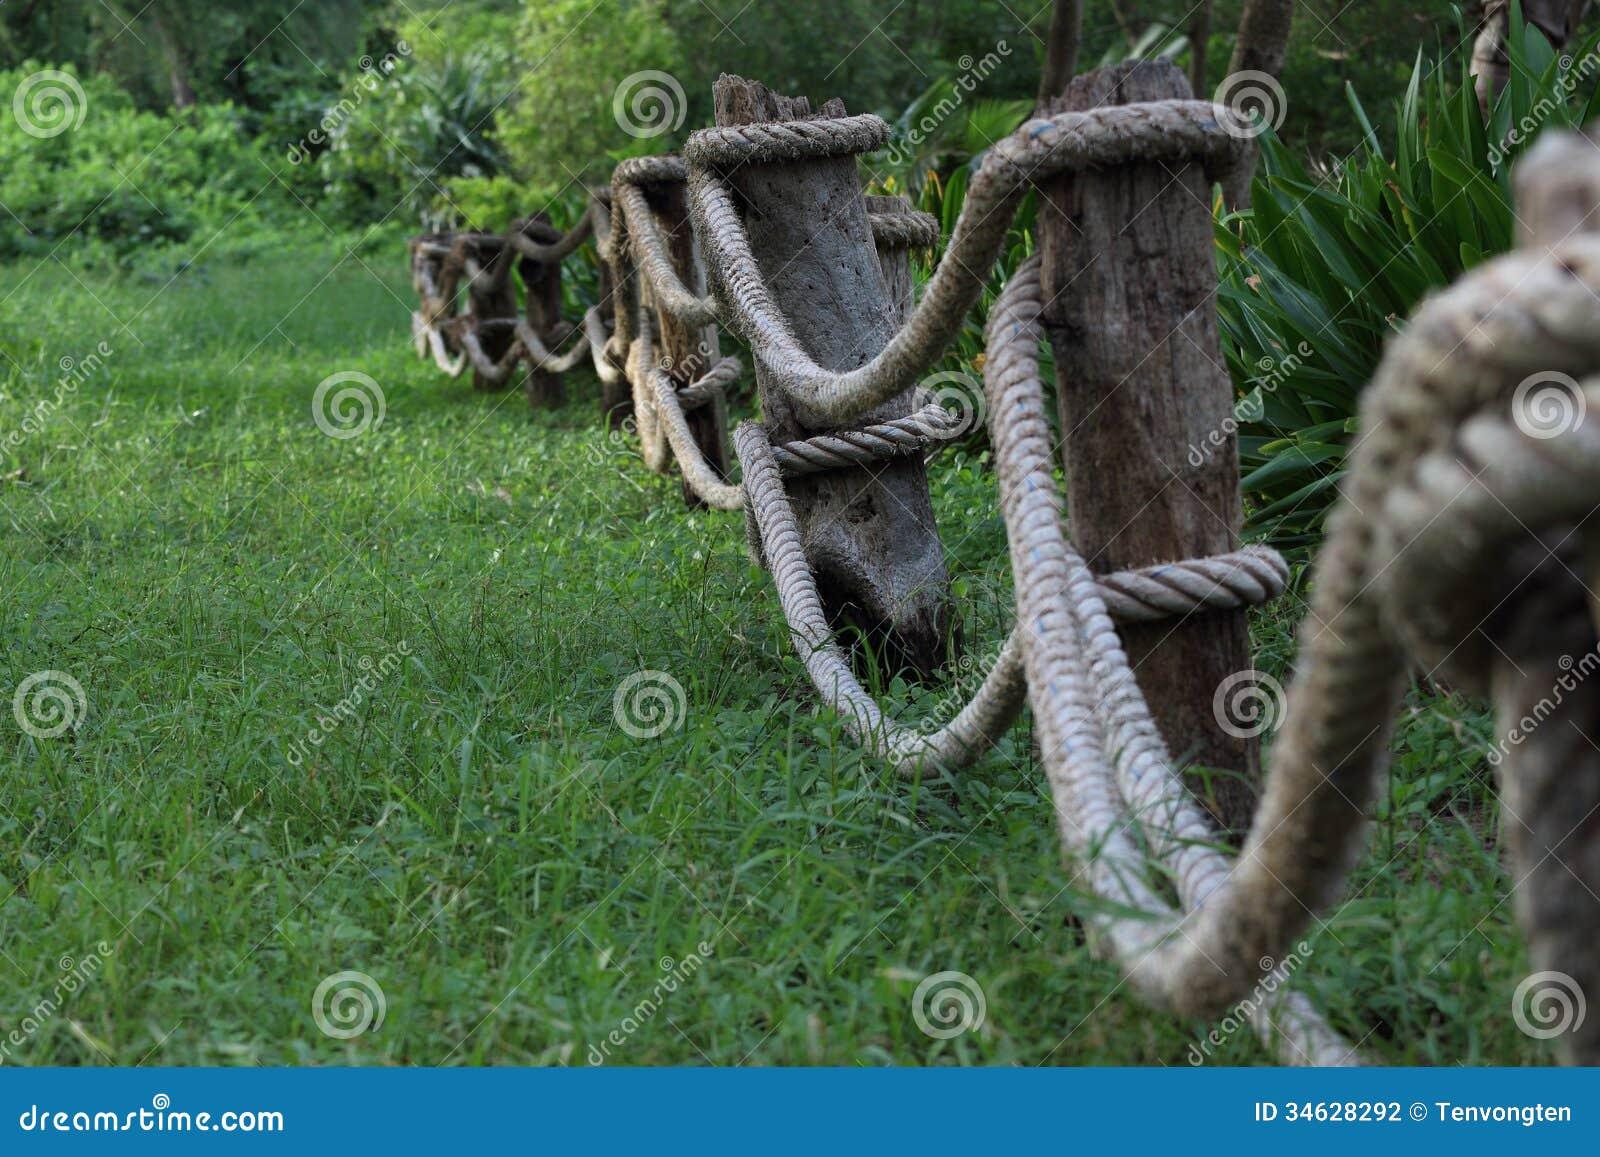 Staket som göras av rep. arkivbild   bild: 34628292